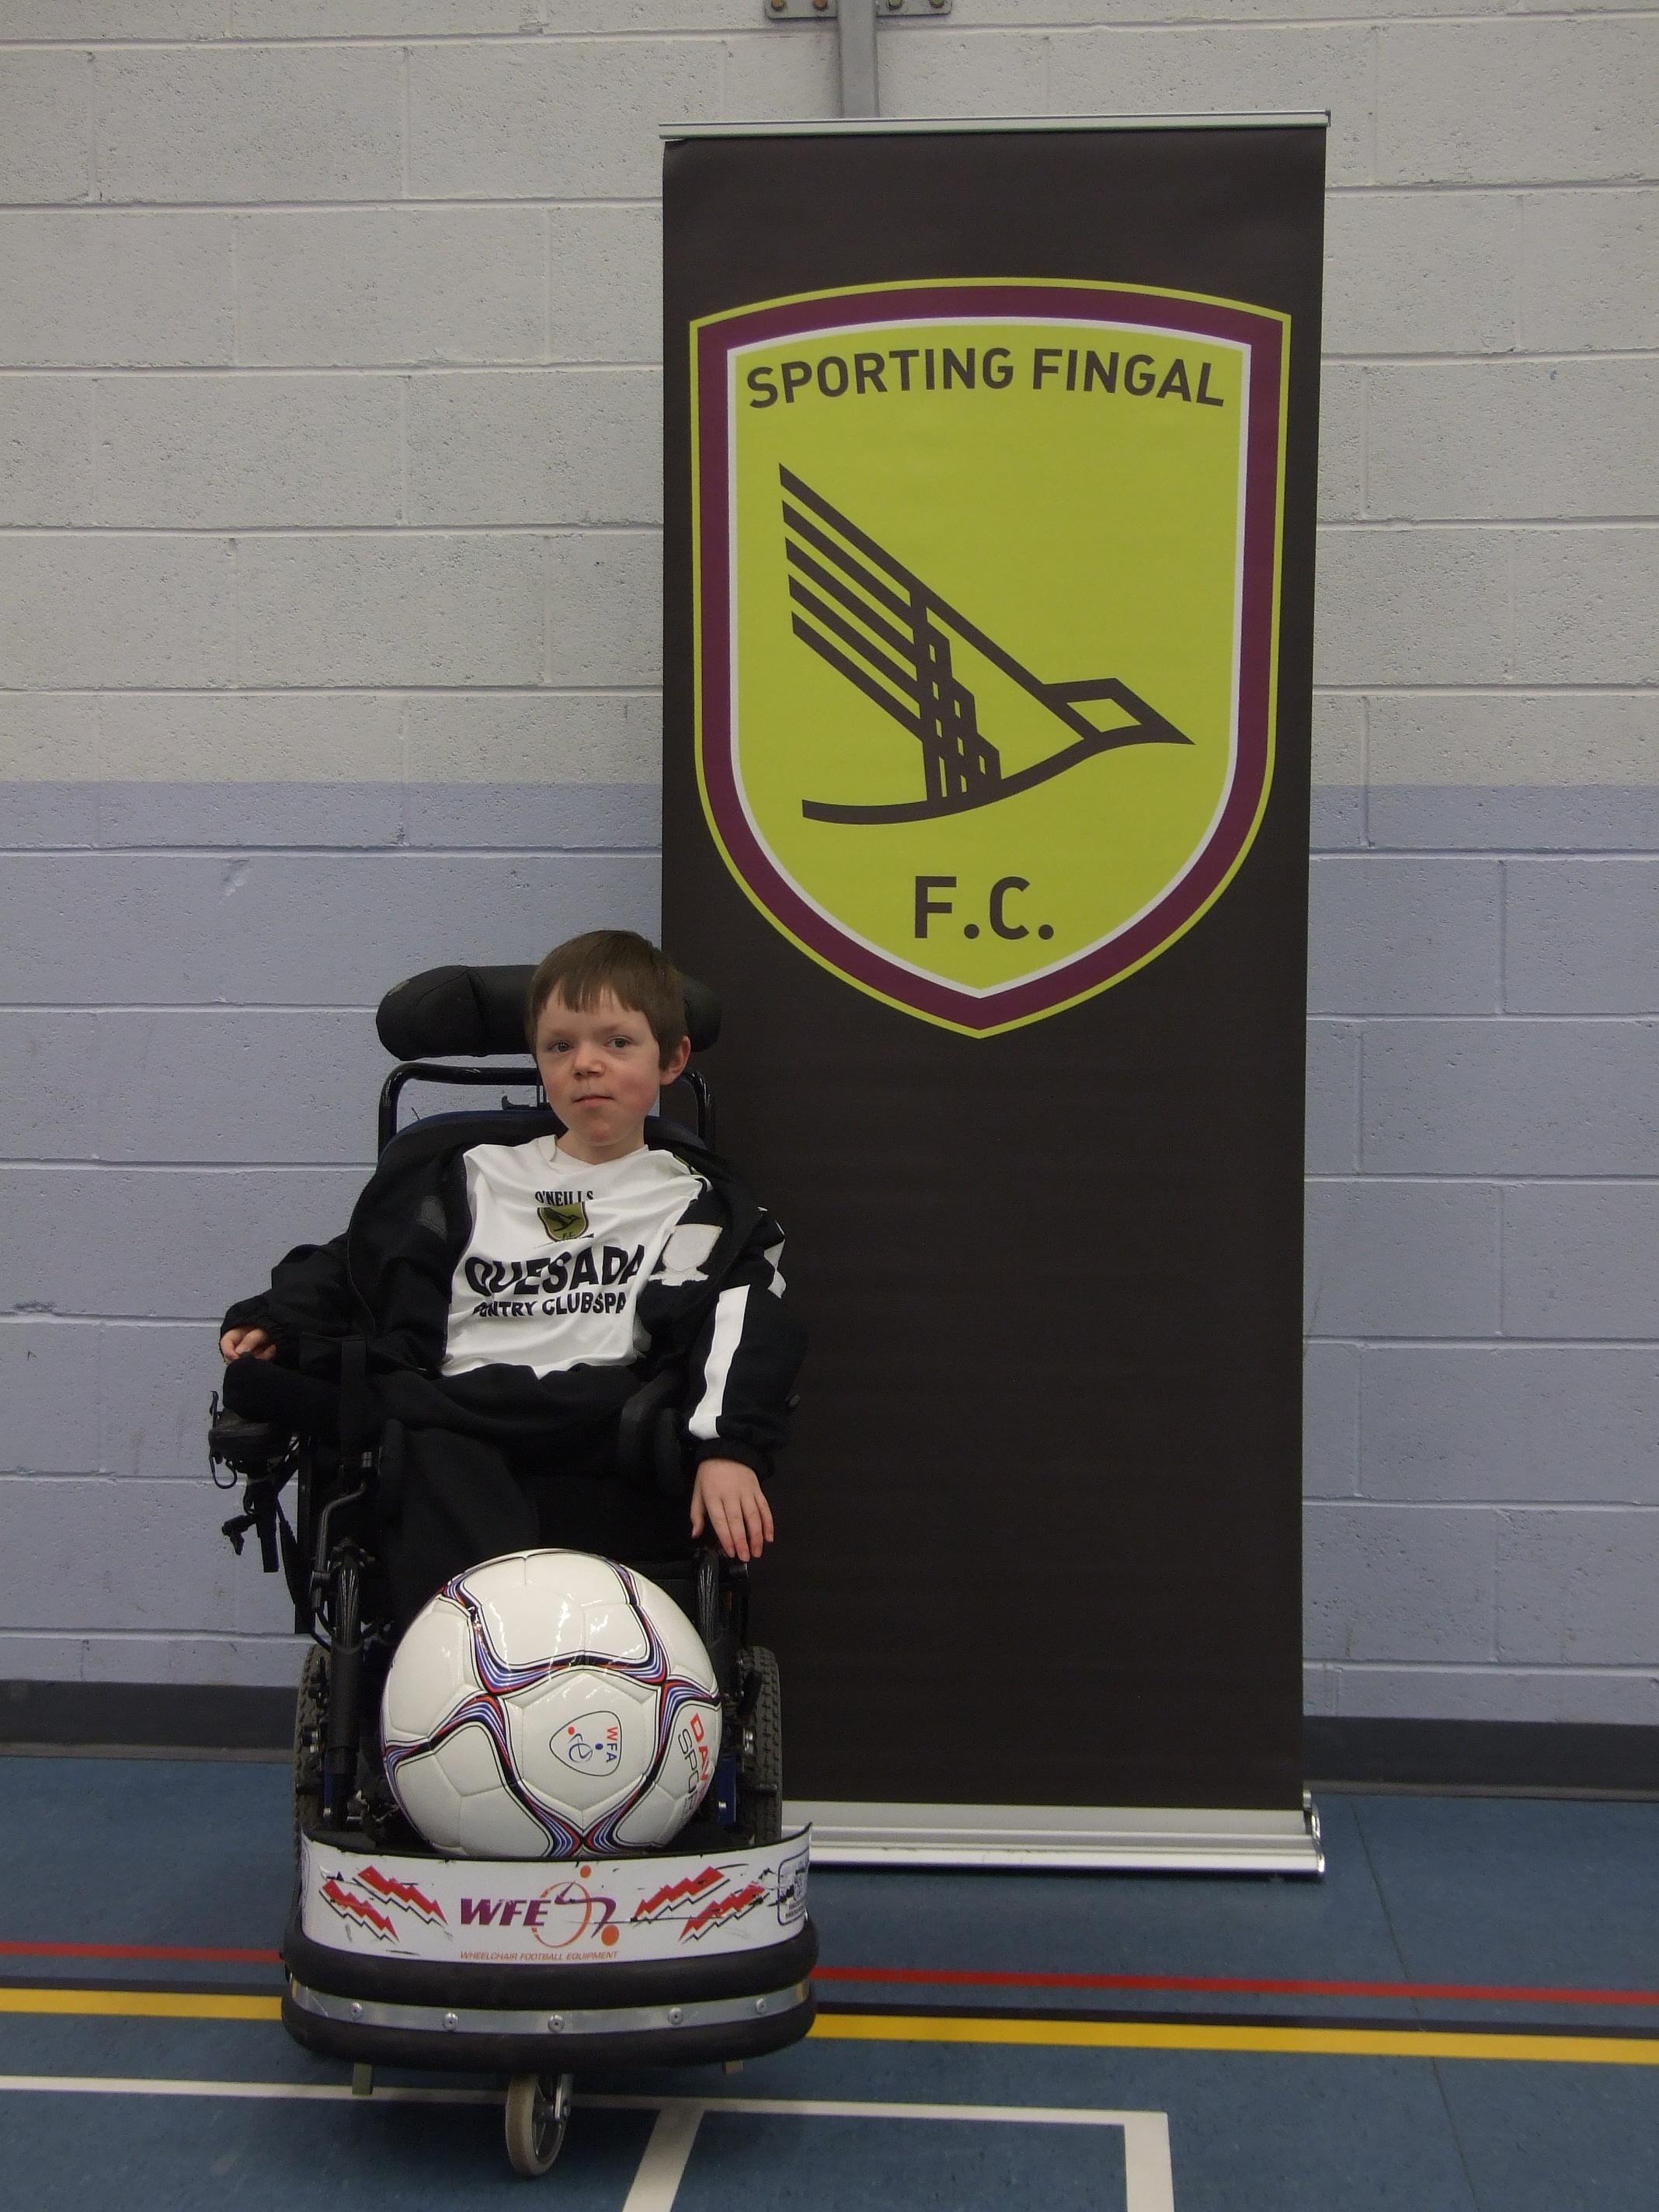 Sporting Fingal ORGINAL CLUB 195.JPG